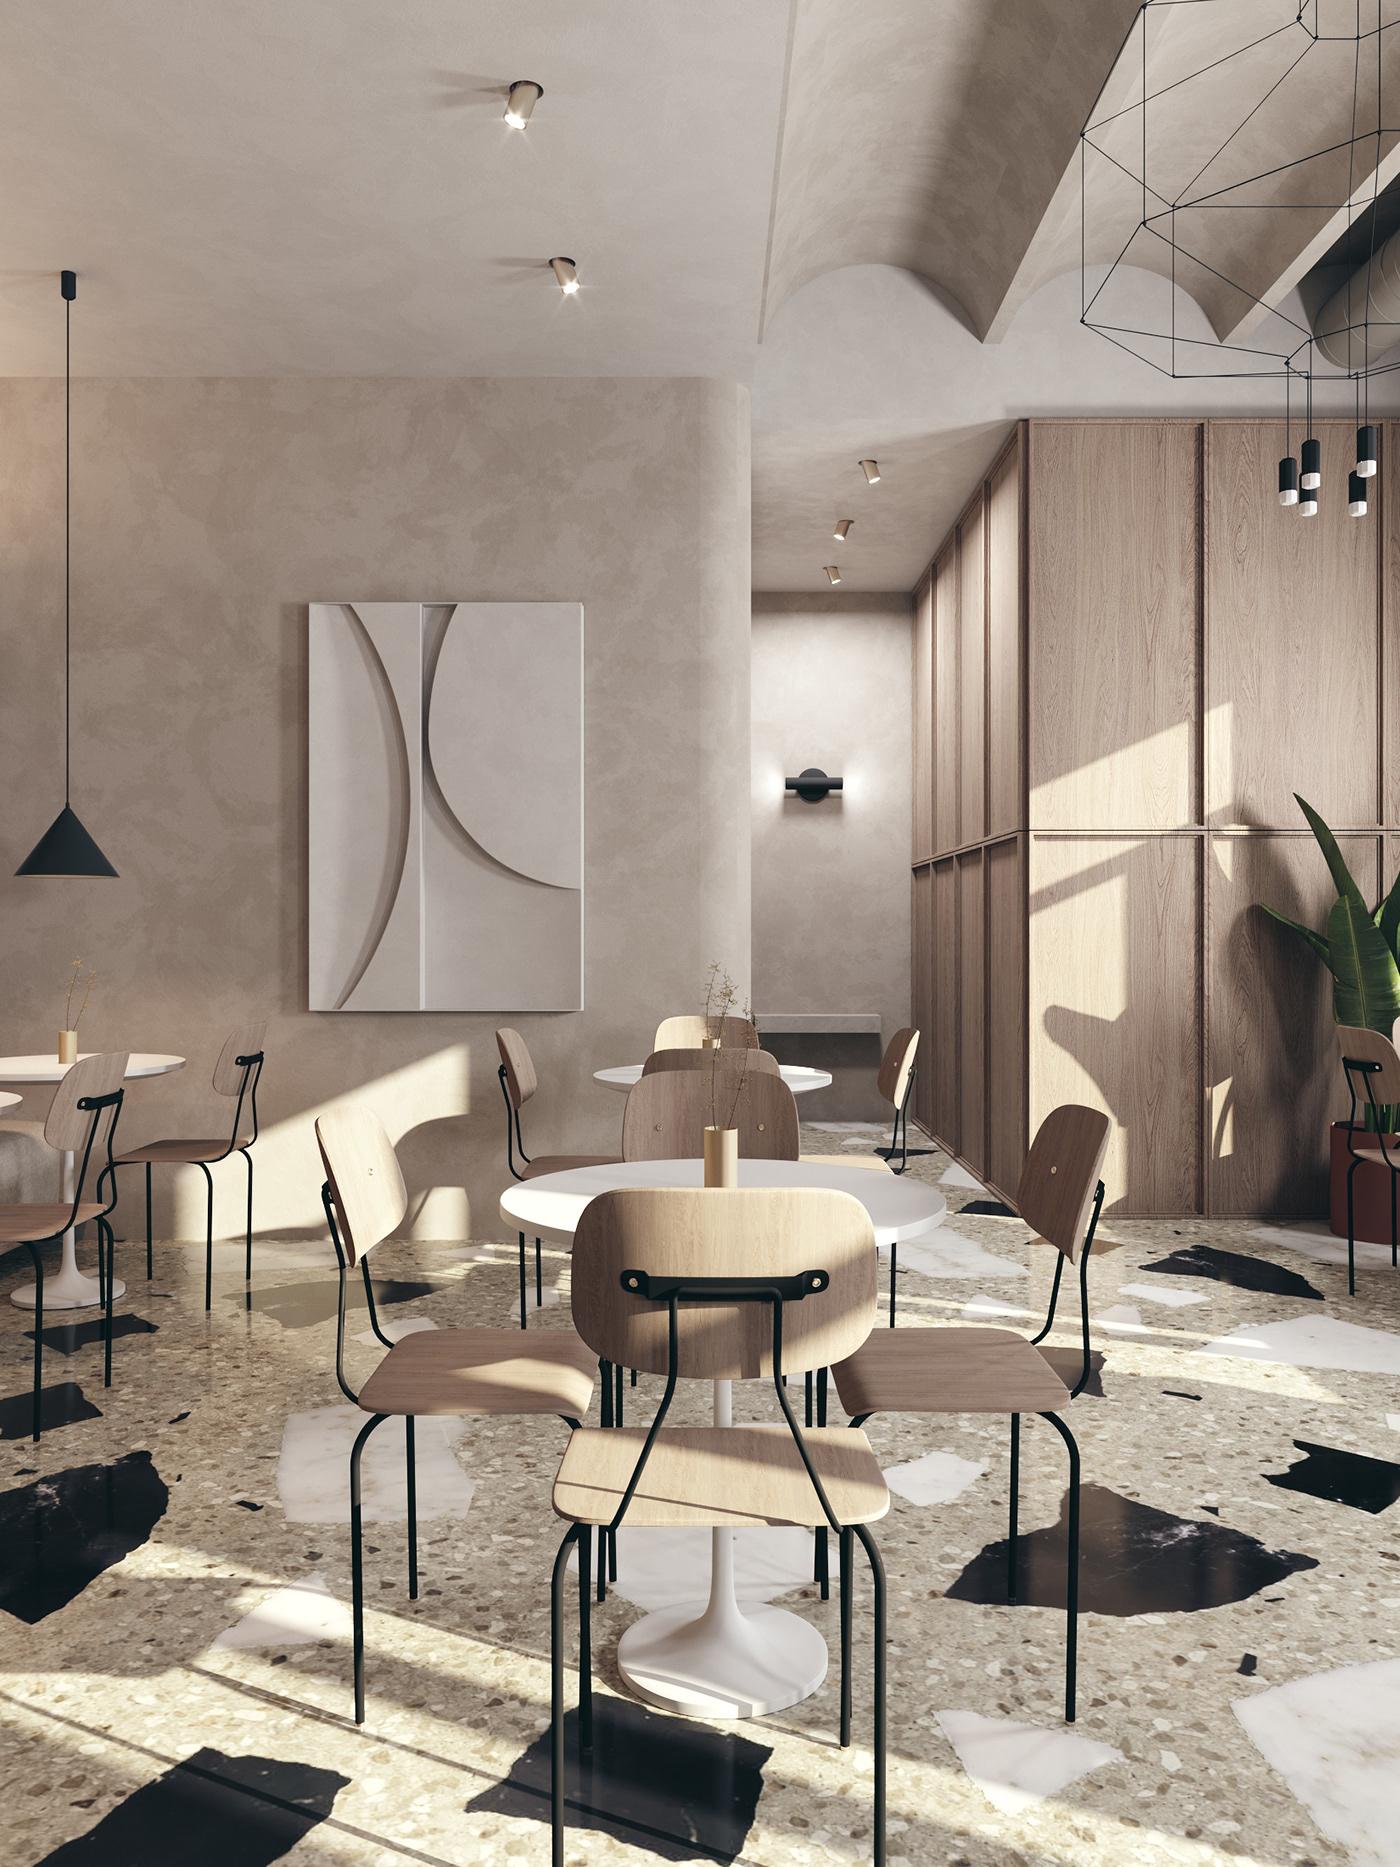 cafe concrete Minimalism wood architecture design Terrazzo arch Interior restaurant